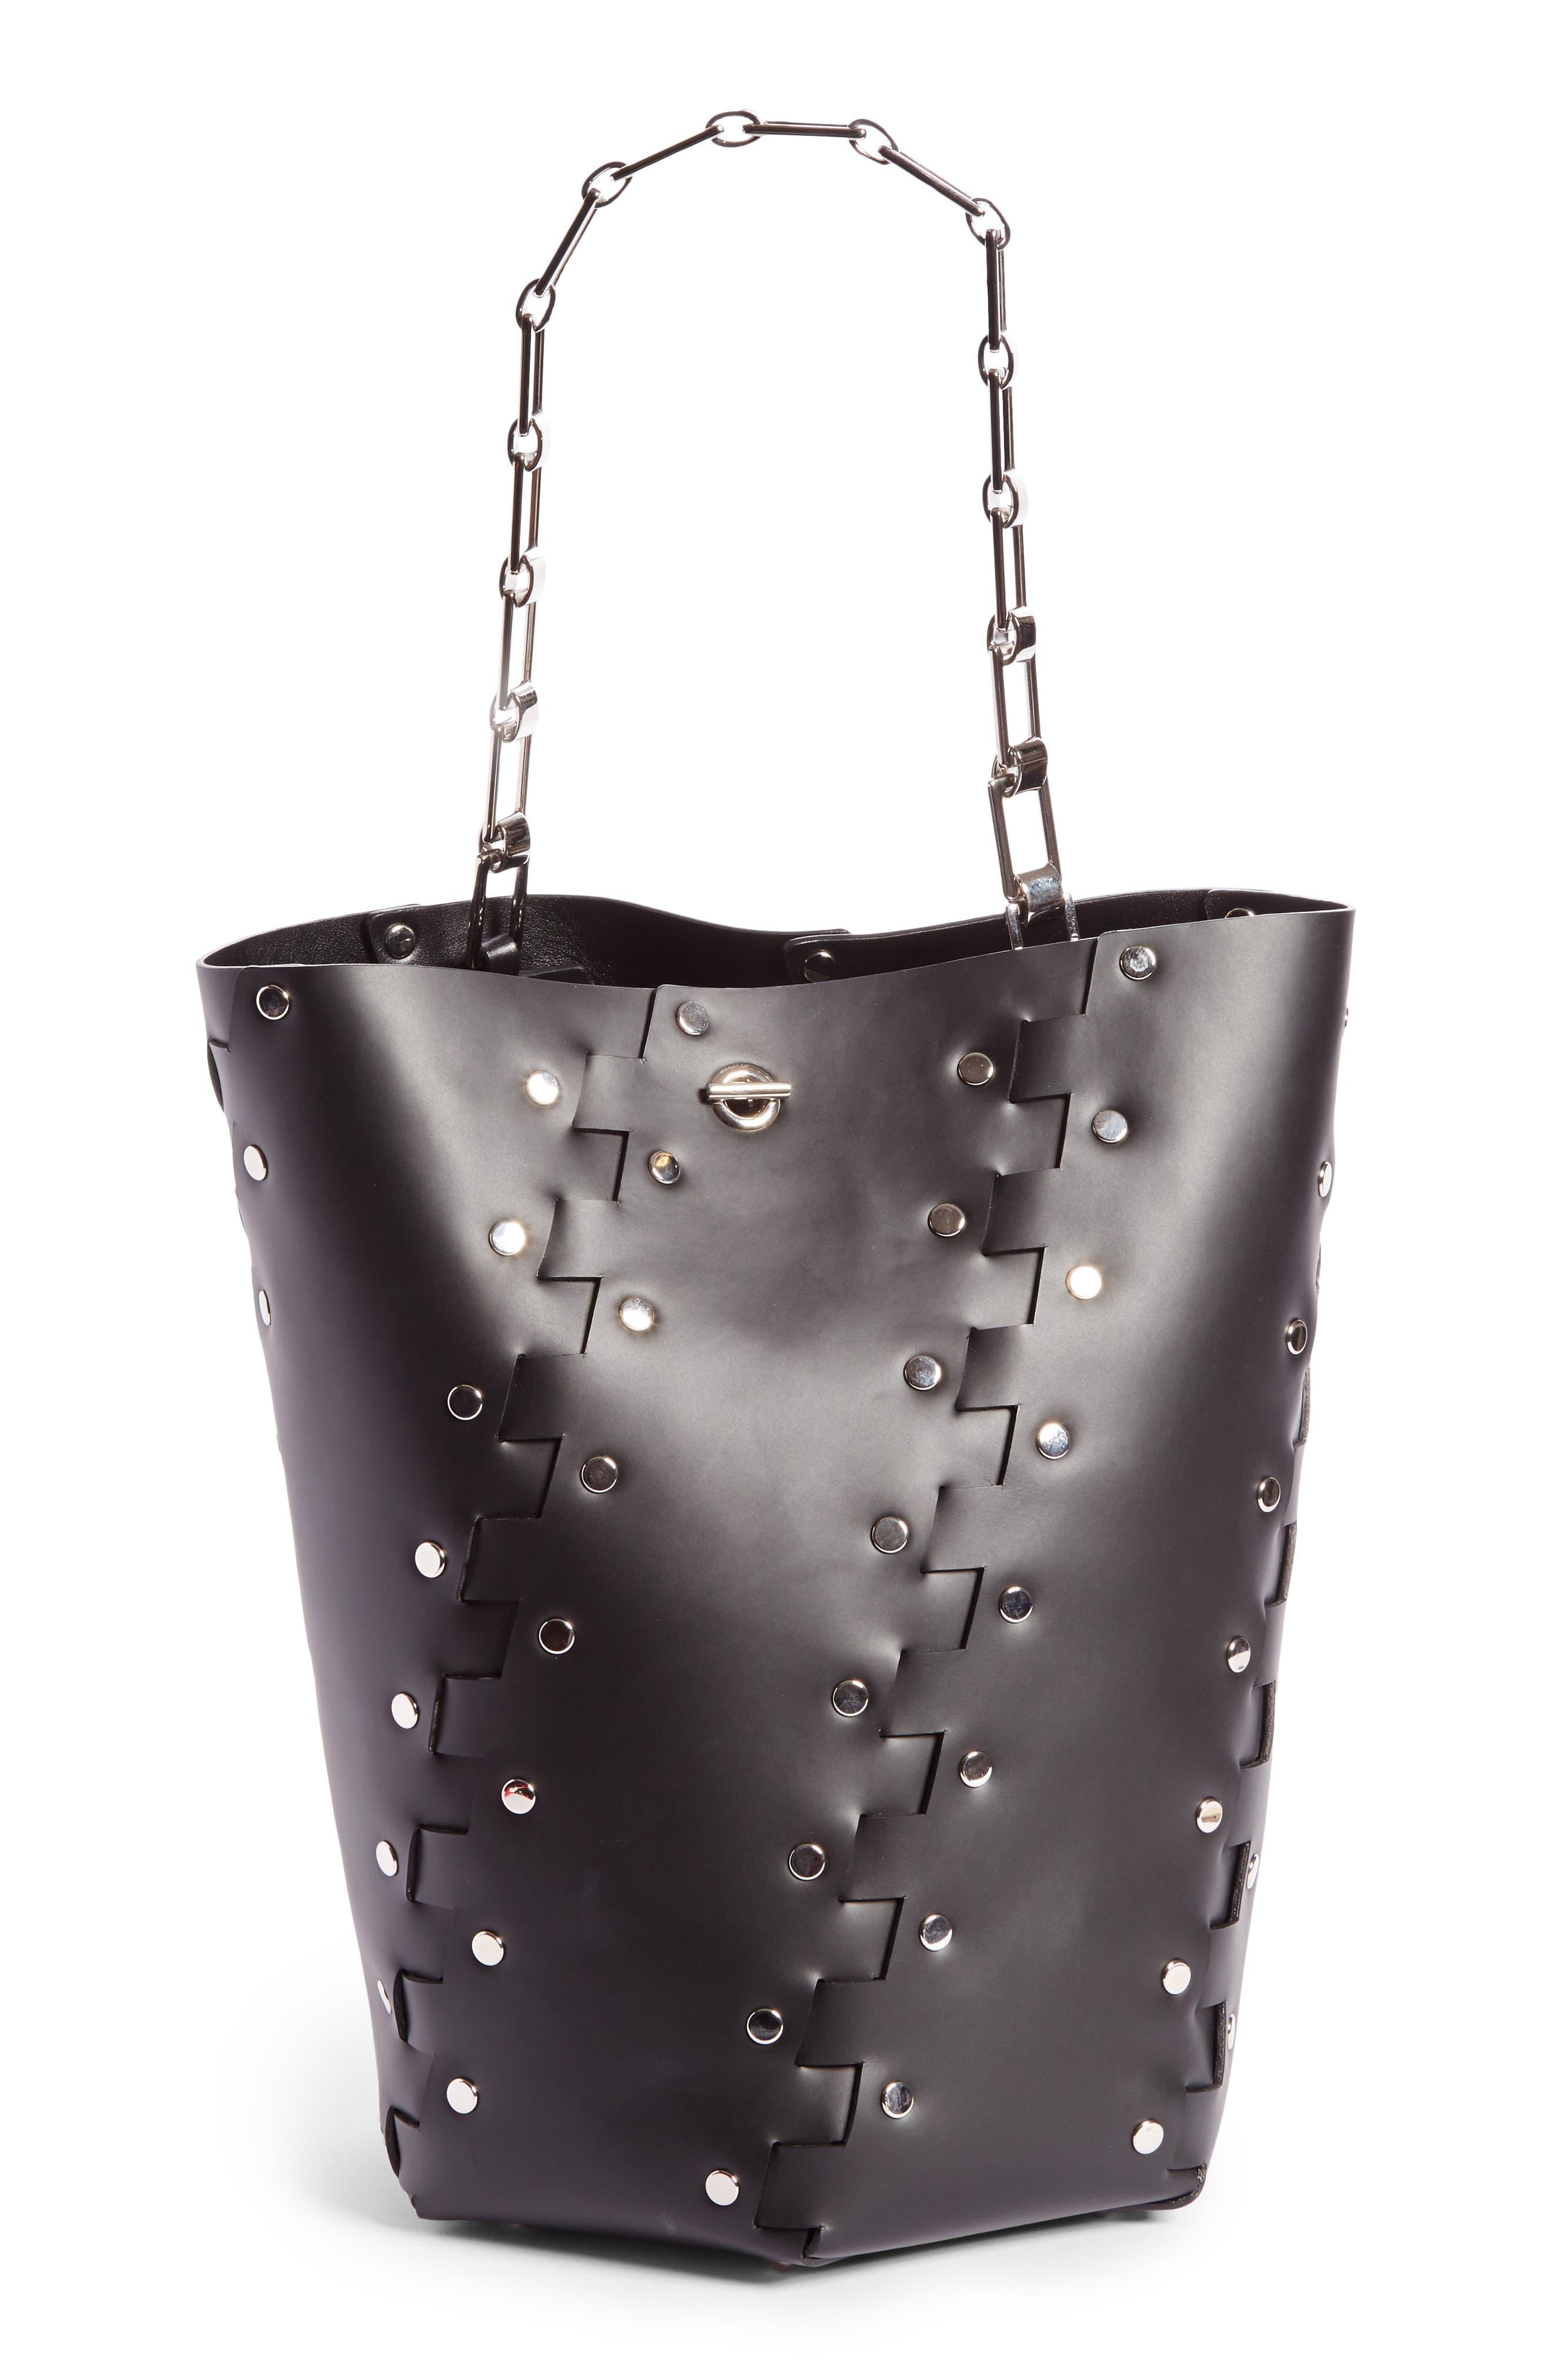 Medium Hex Studded Leather Bucket Bag,                         Main,                         color, 001